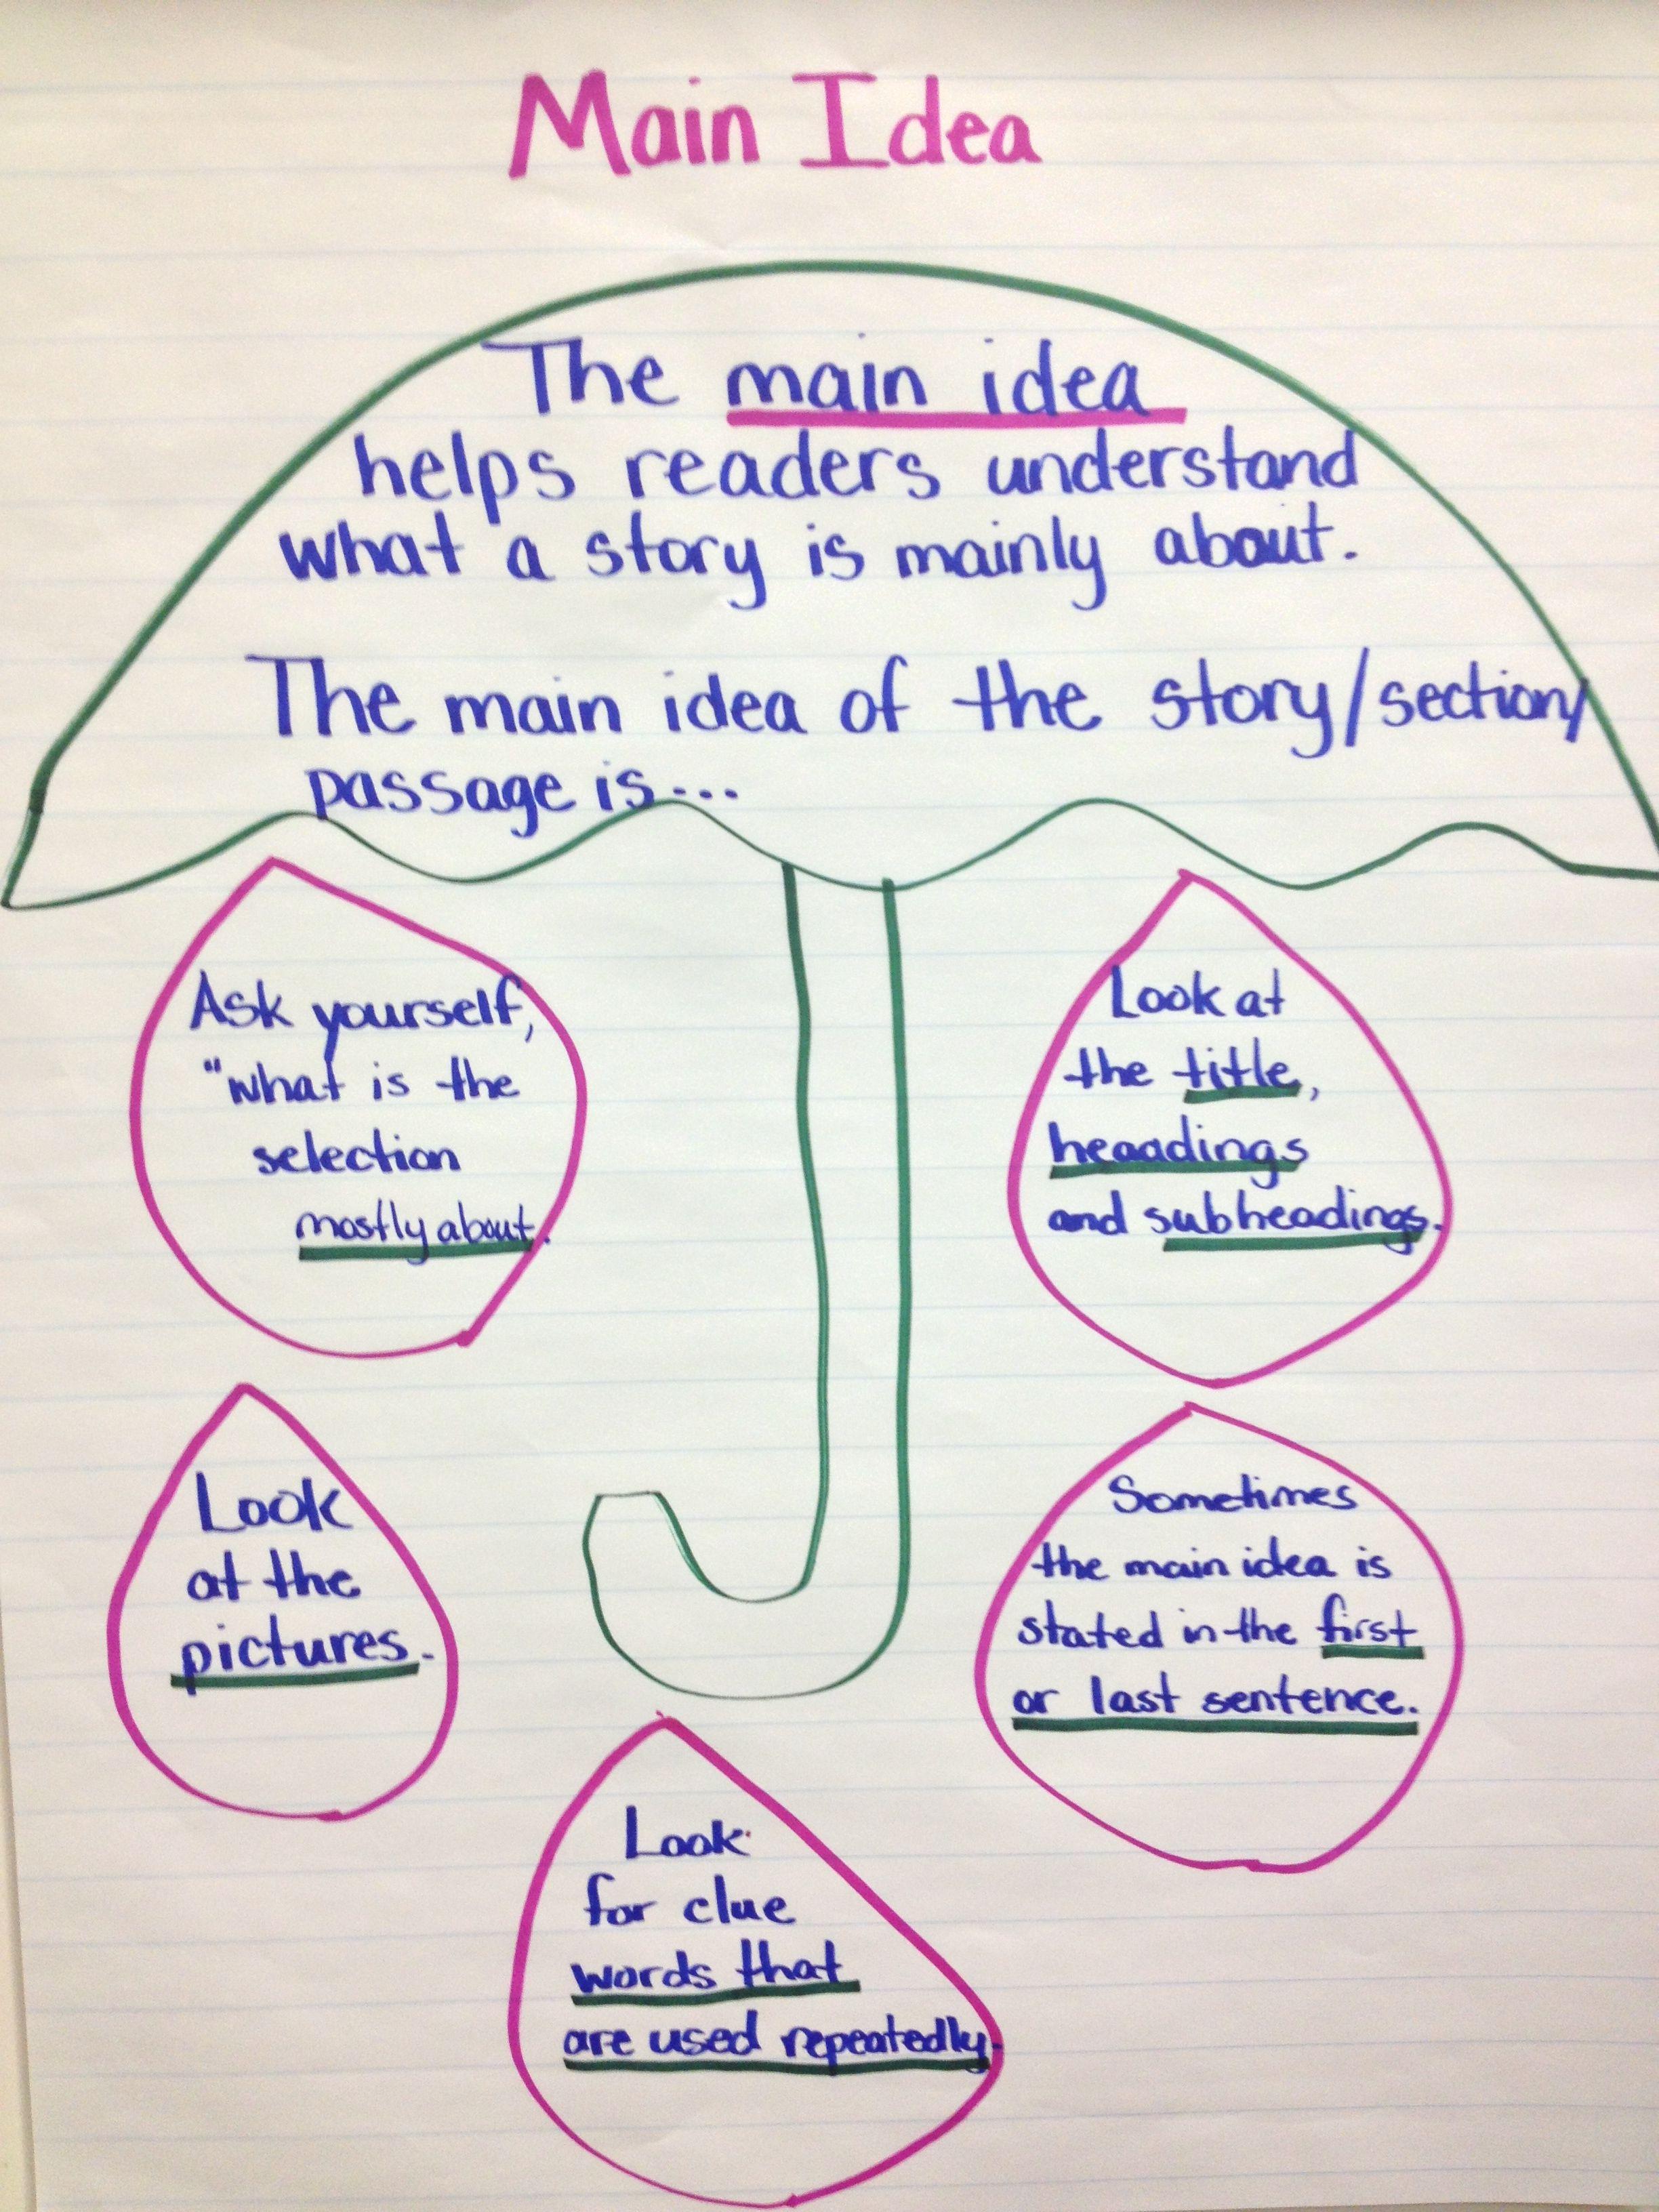 Main Idea Chart I Created For My Class Using The Umbrella